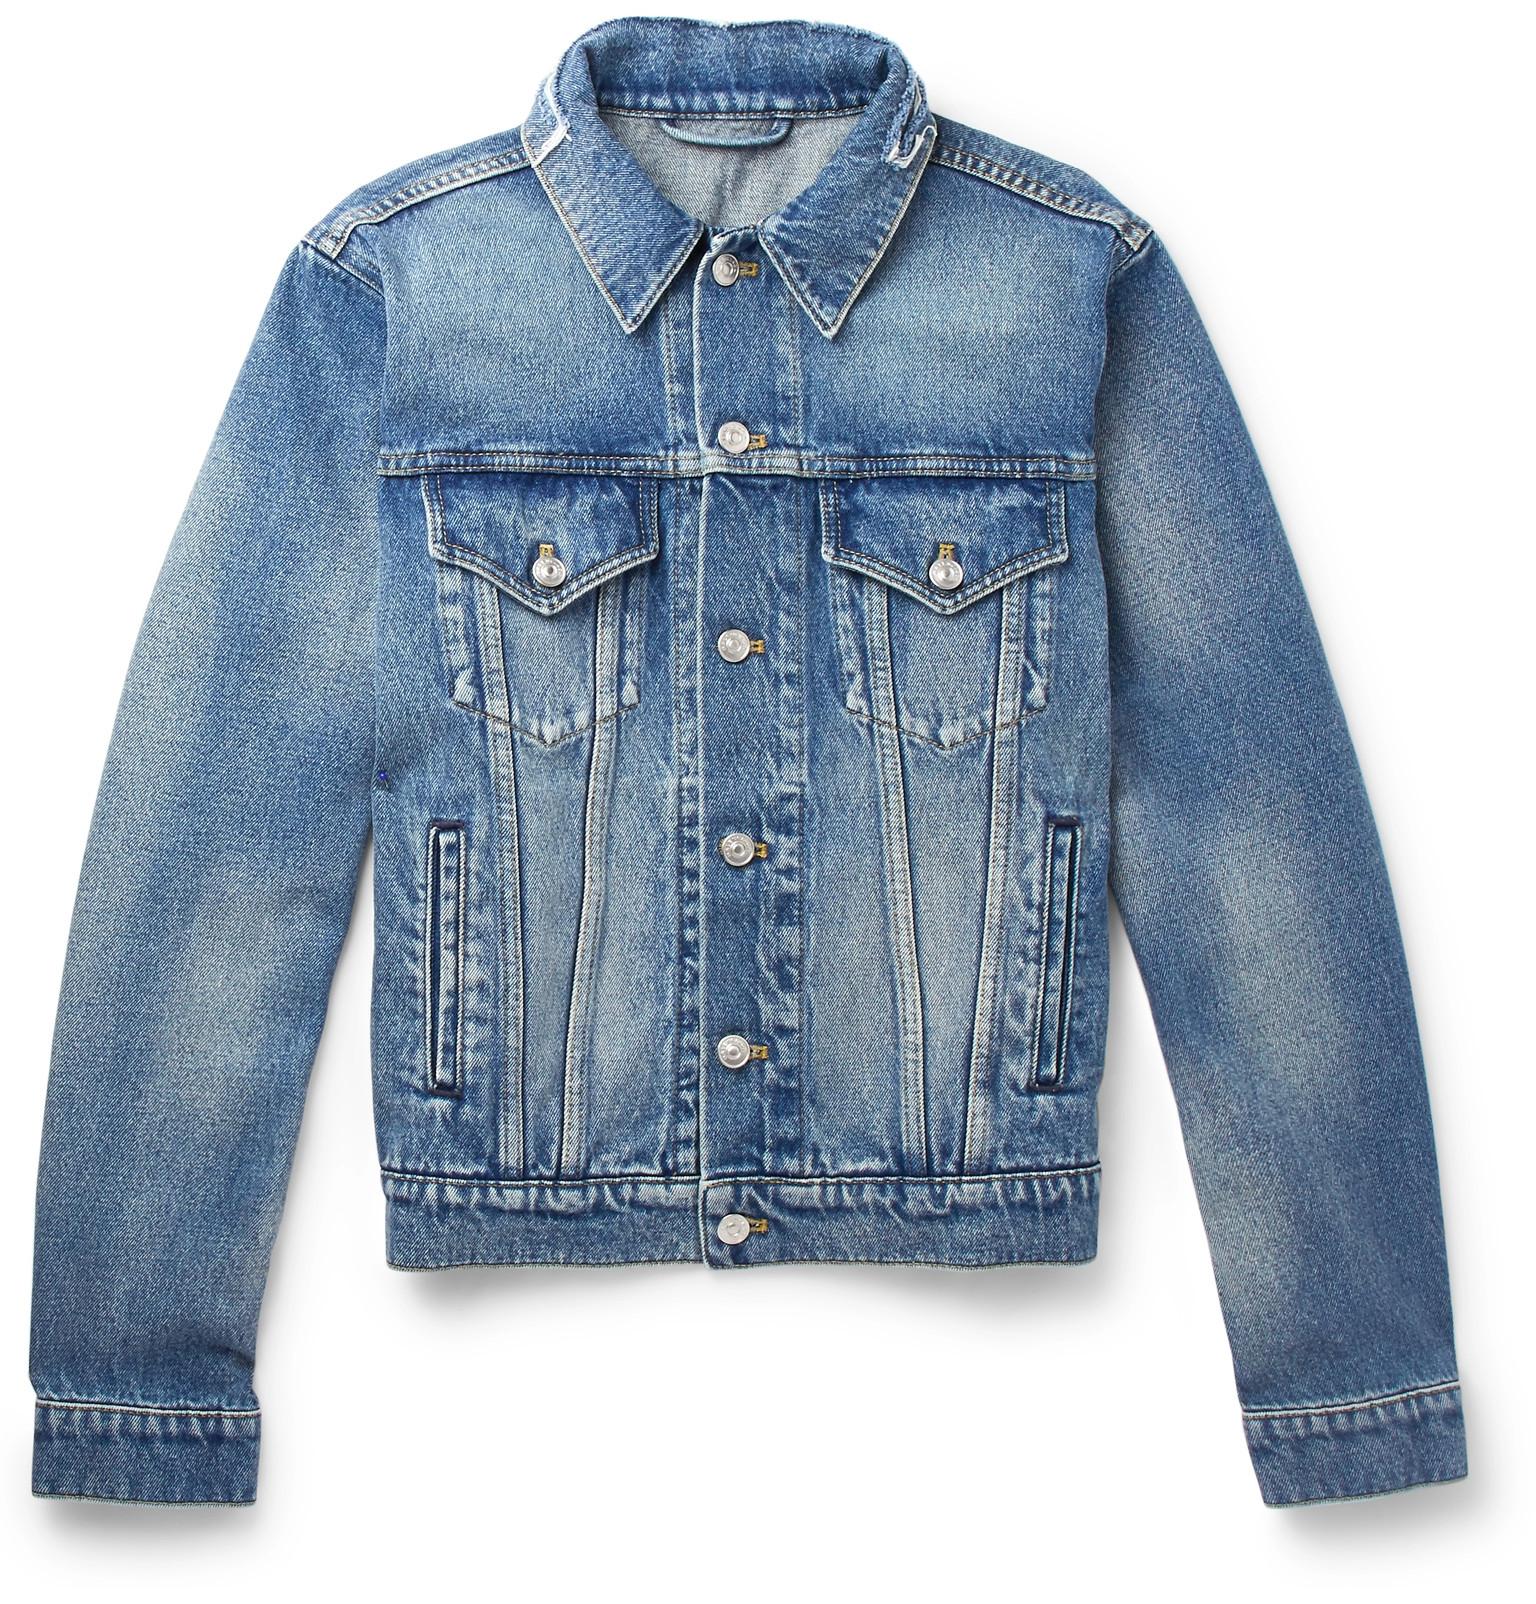 d6bfa43d93 Balenciaga - Cropped Embroidered Distressed Denim Jacket